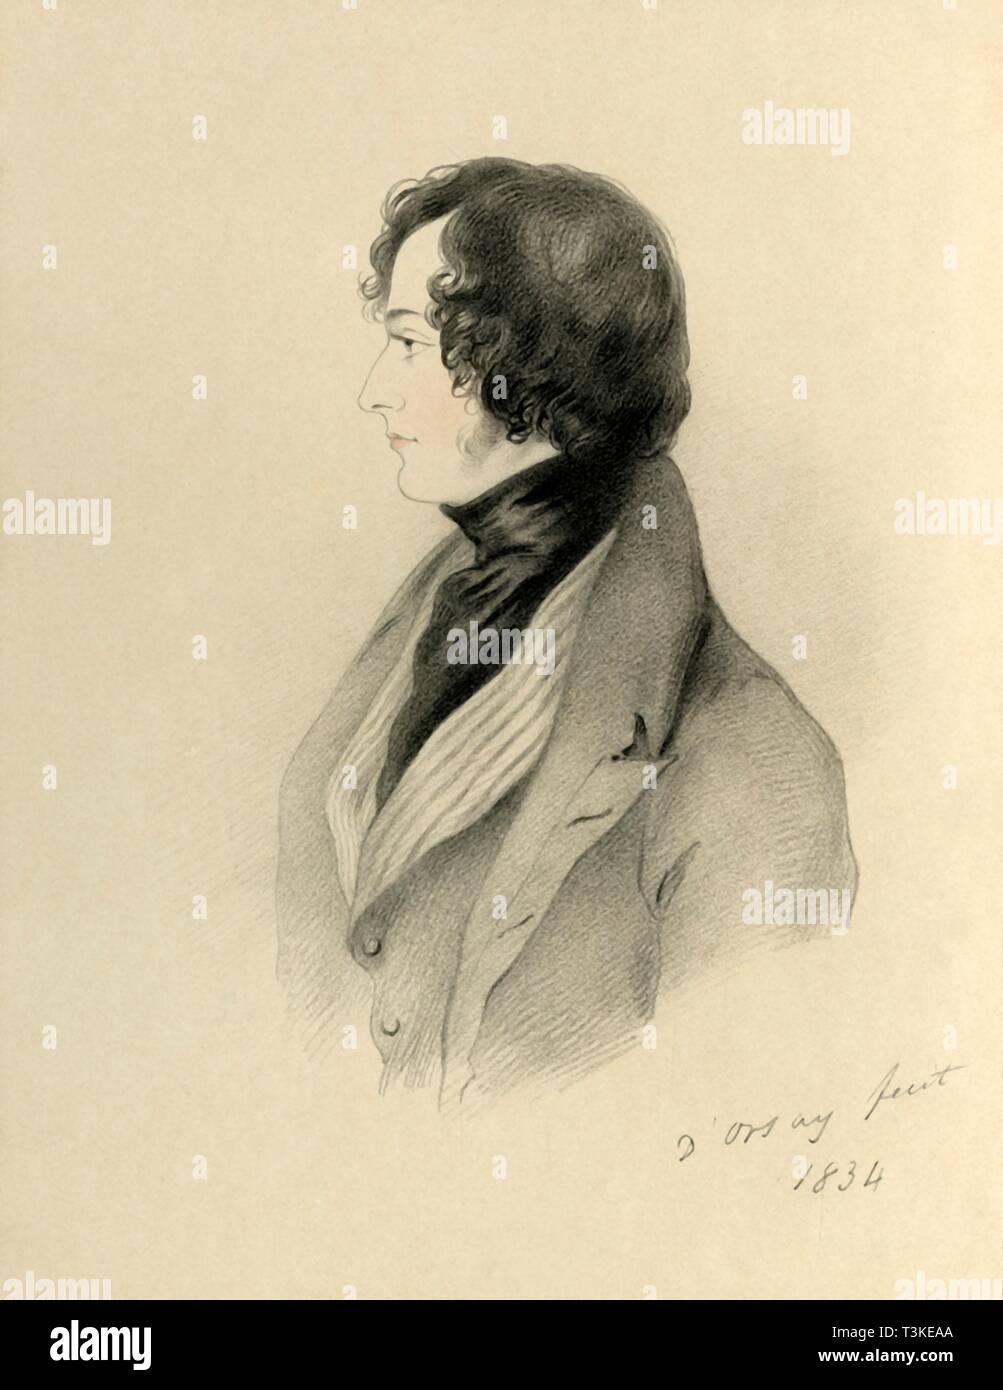 'Right Honourable Benjamin Disraeli MP', 1834. Creator: Richard James Lane. - Stock Image